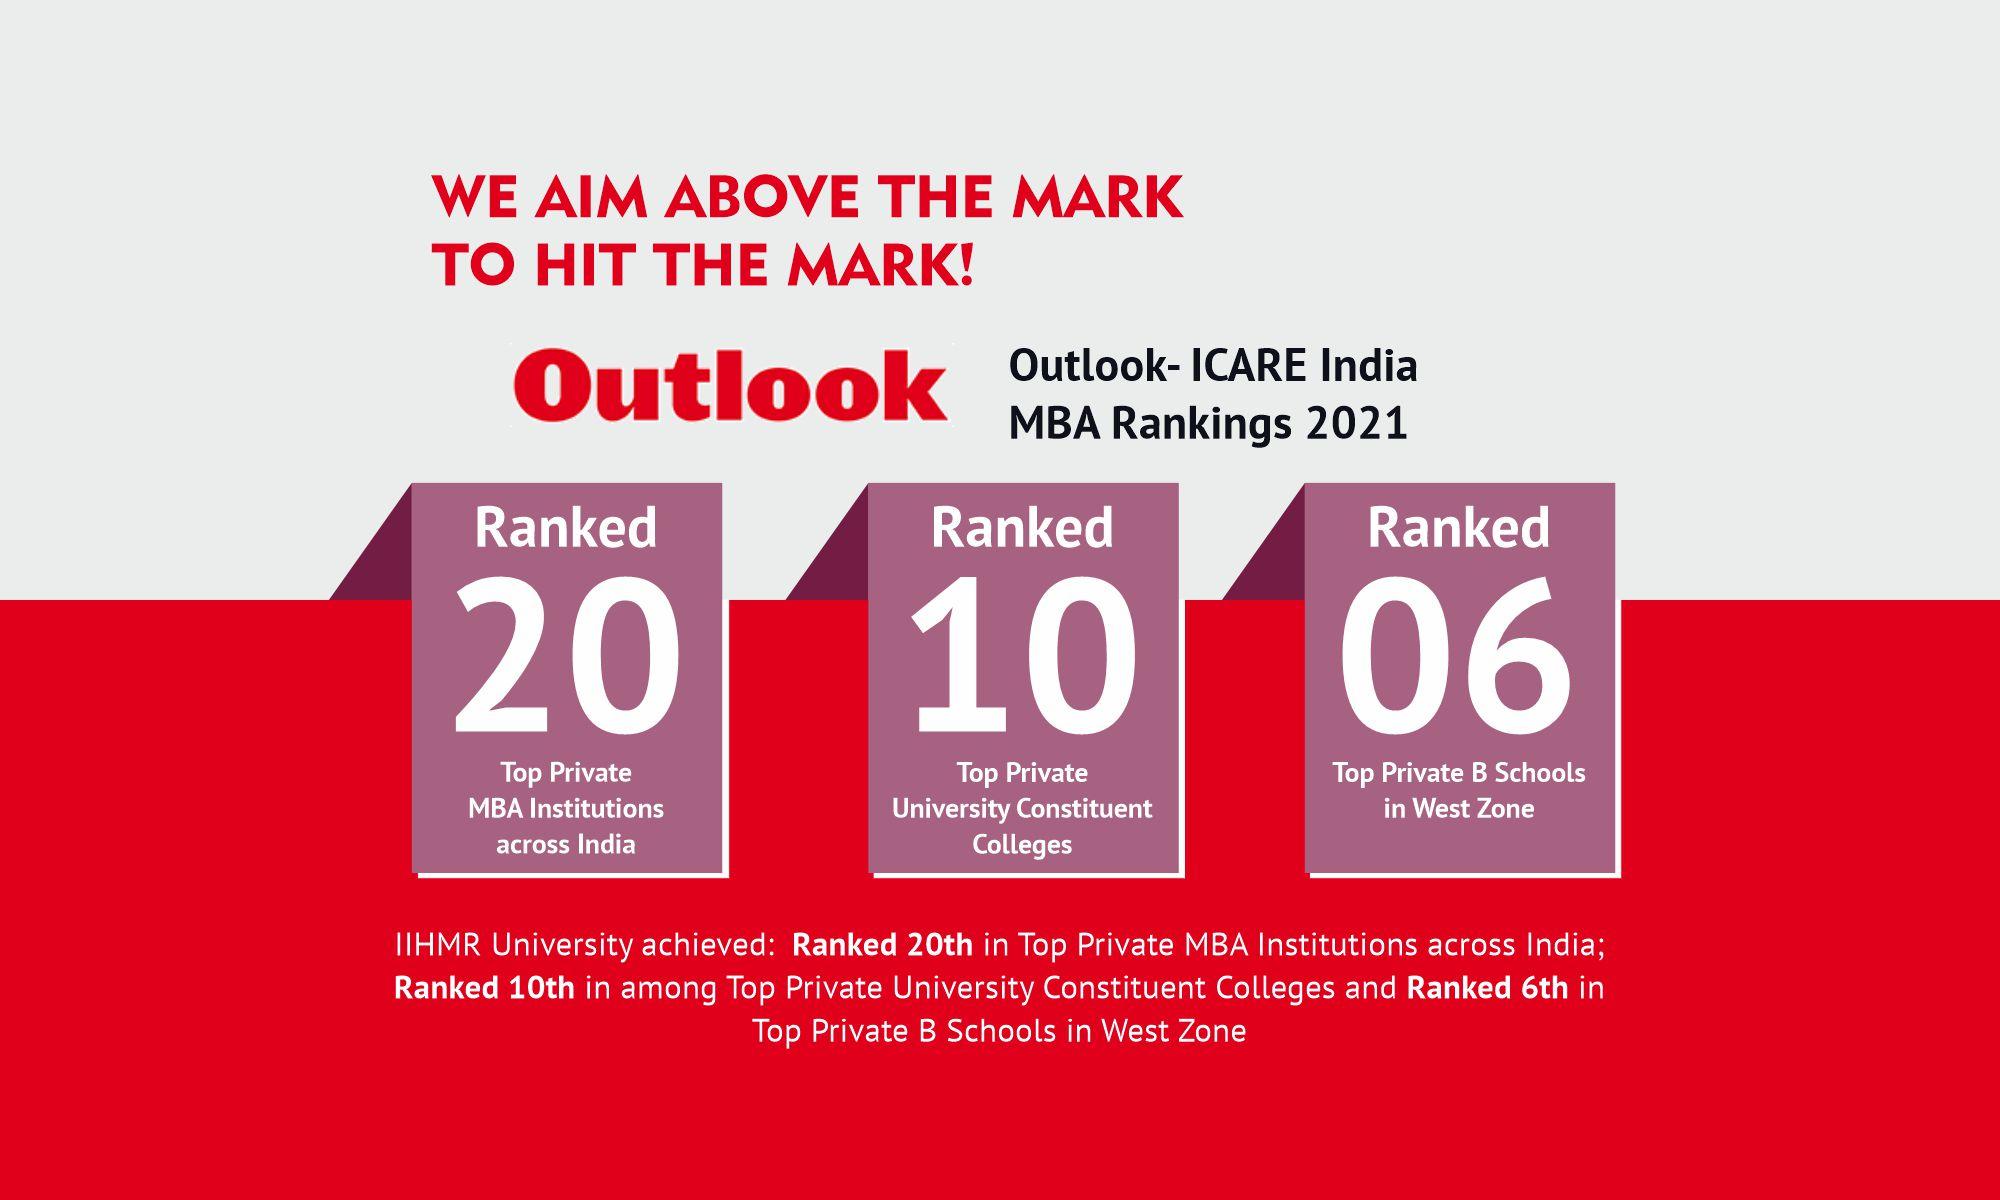 Outlook-ICARE India Best B-School Ranking 2021 || IIHMR University